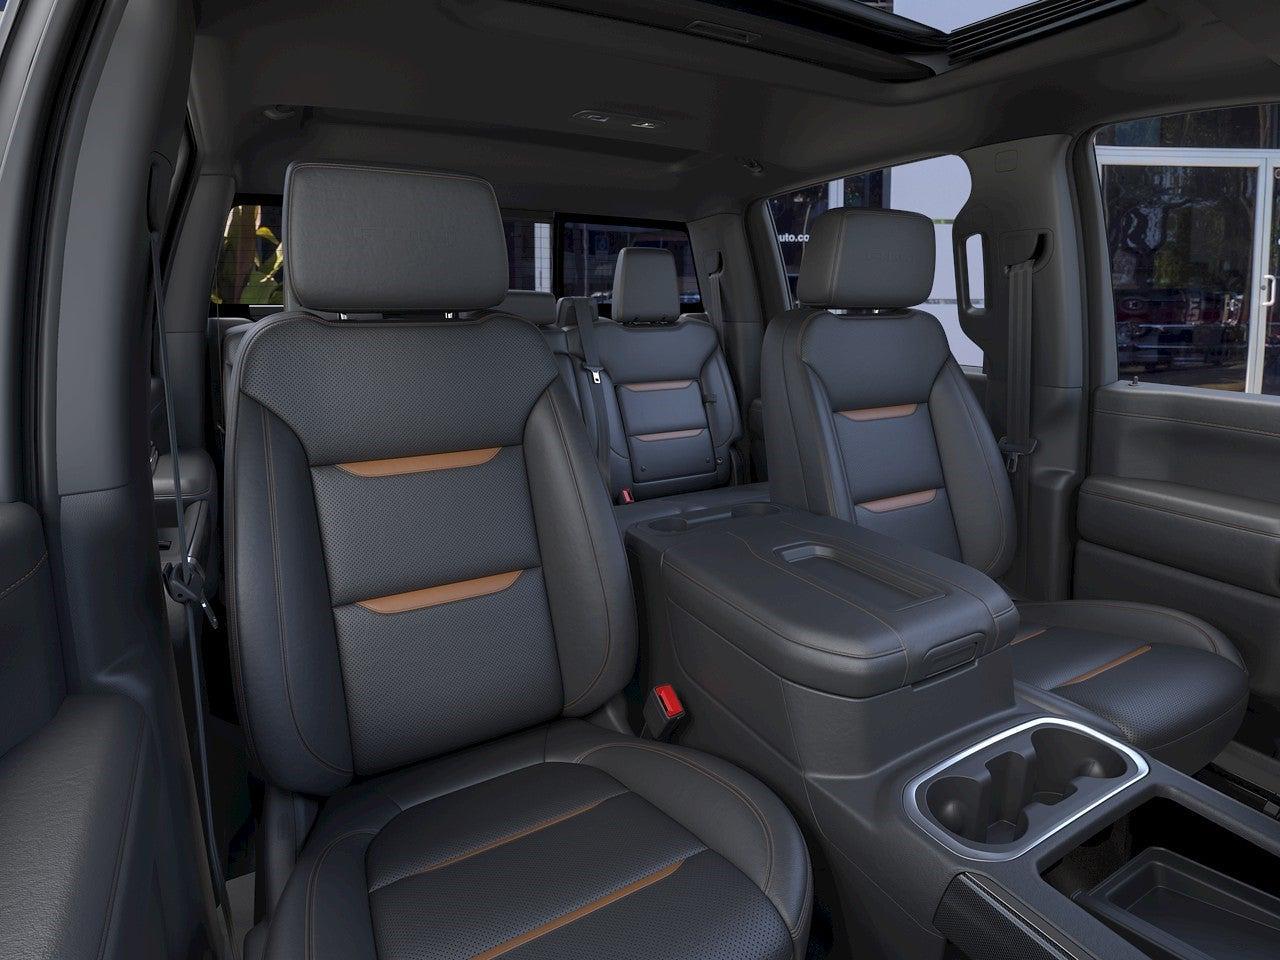 2021 GMC Sierra 2500 Crew Cab 4x4, Pickup #T21304 - photo 33